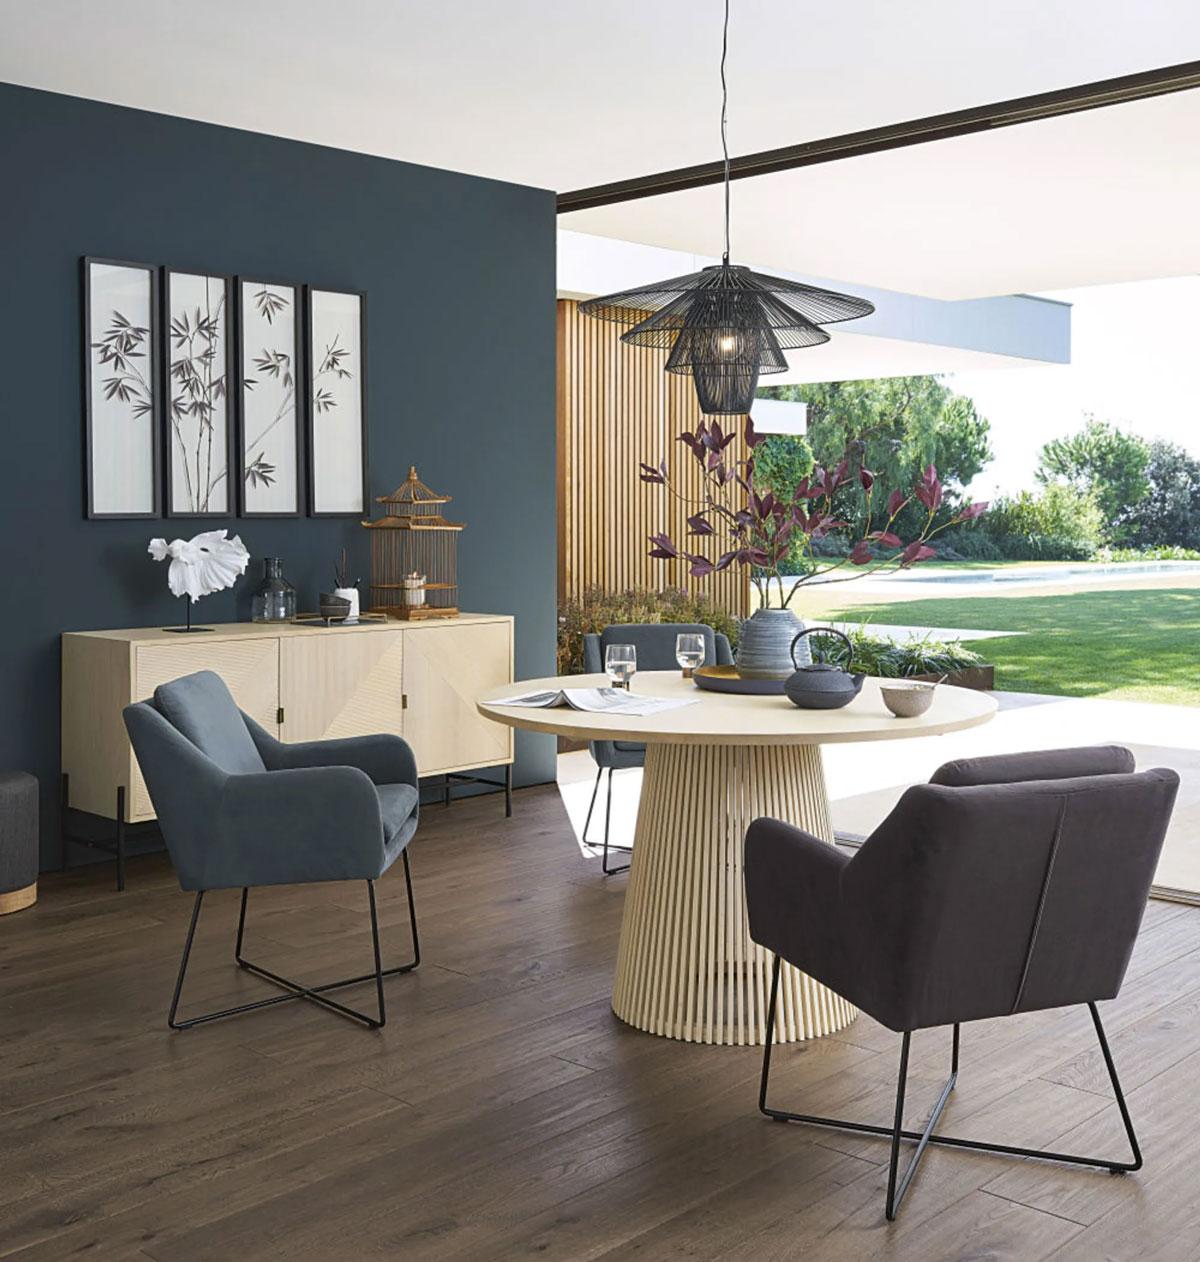 Maisons du monde sala da pranzo stile moderno